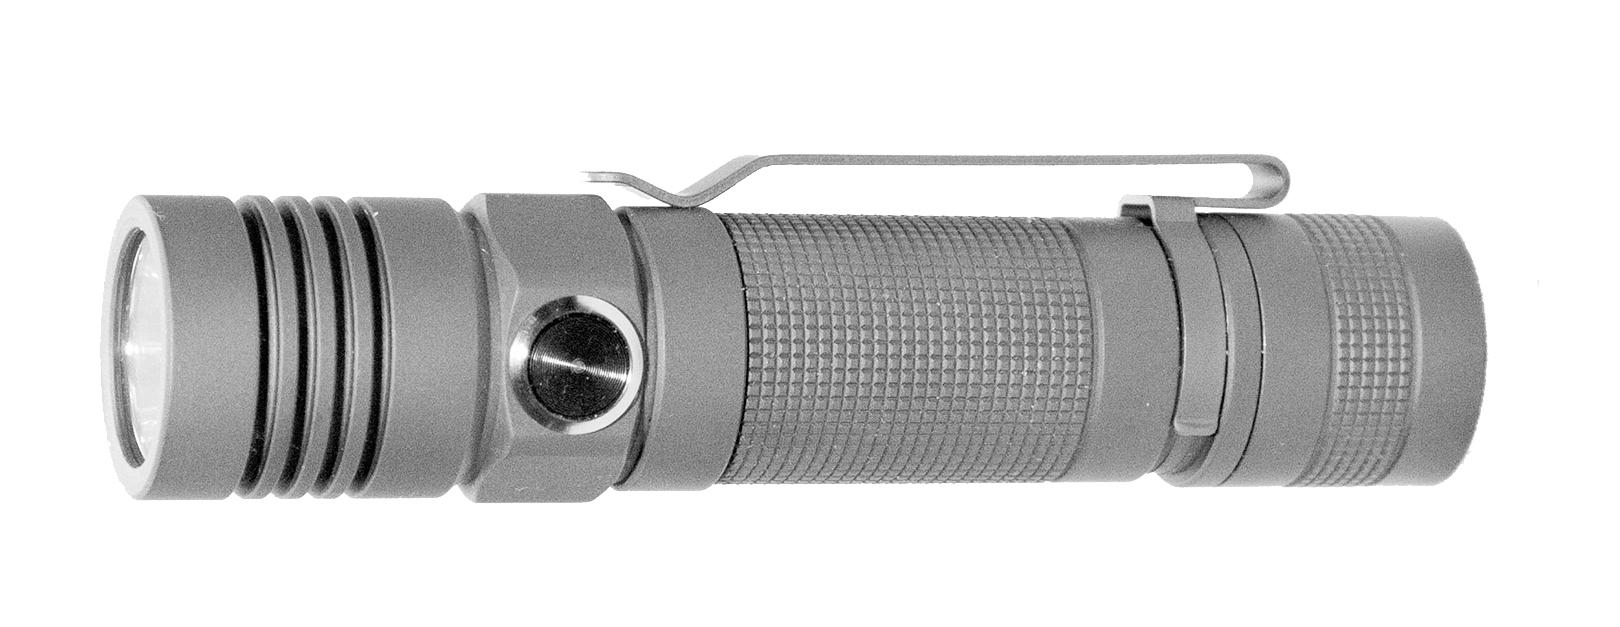 Olight S30-Ti Baton